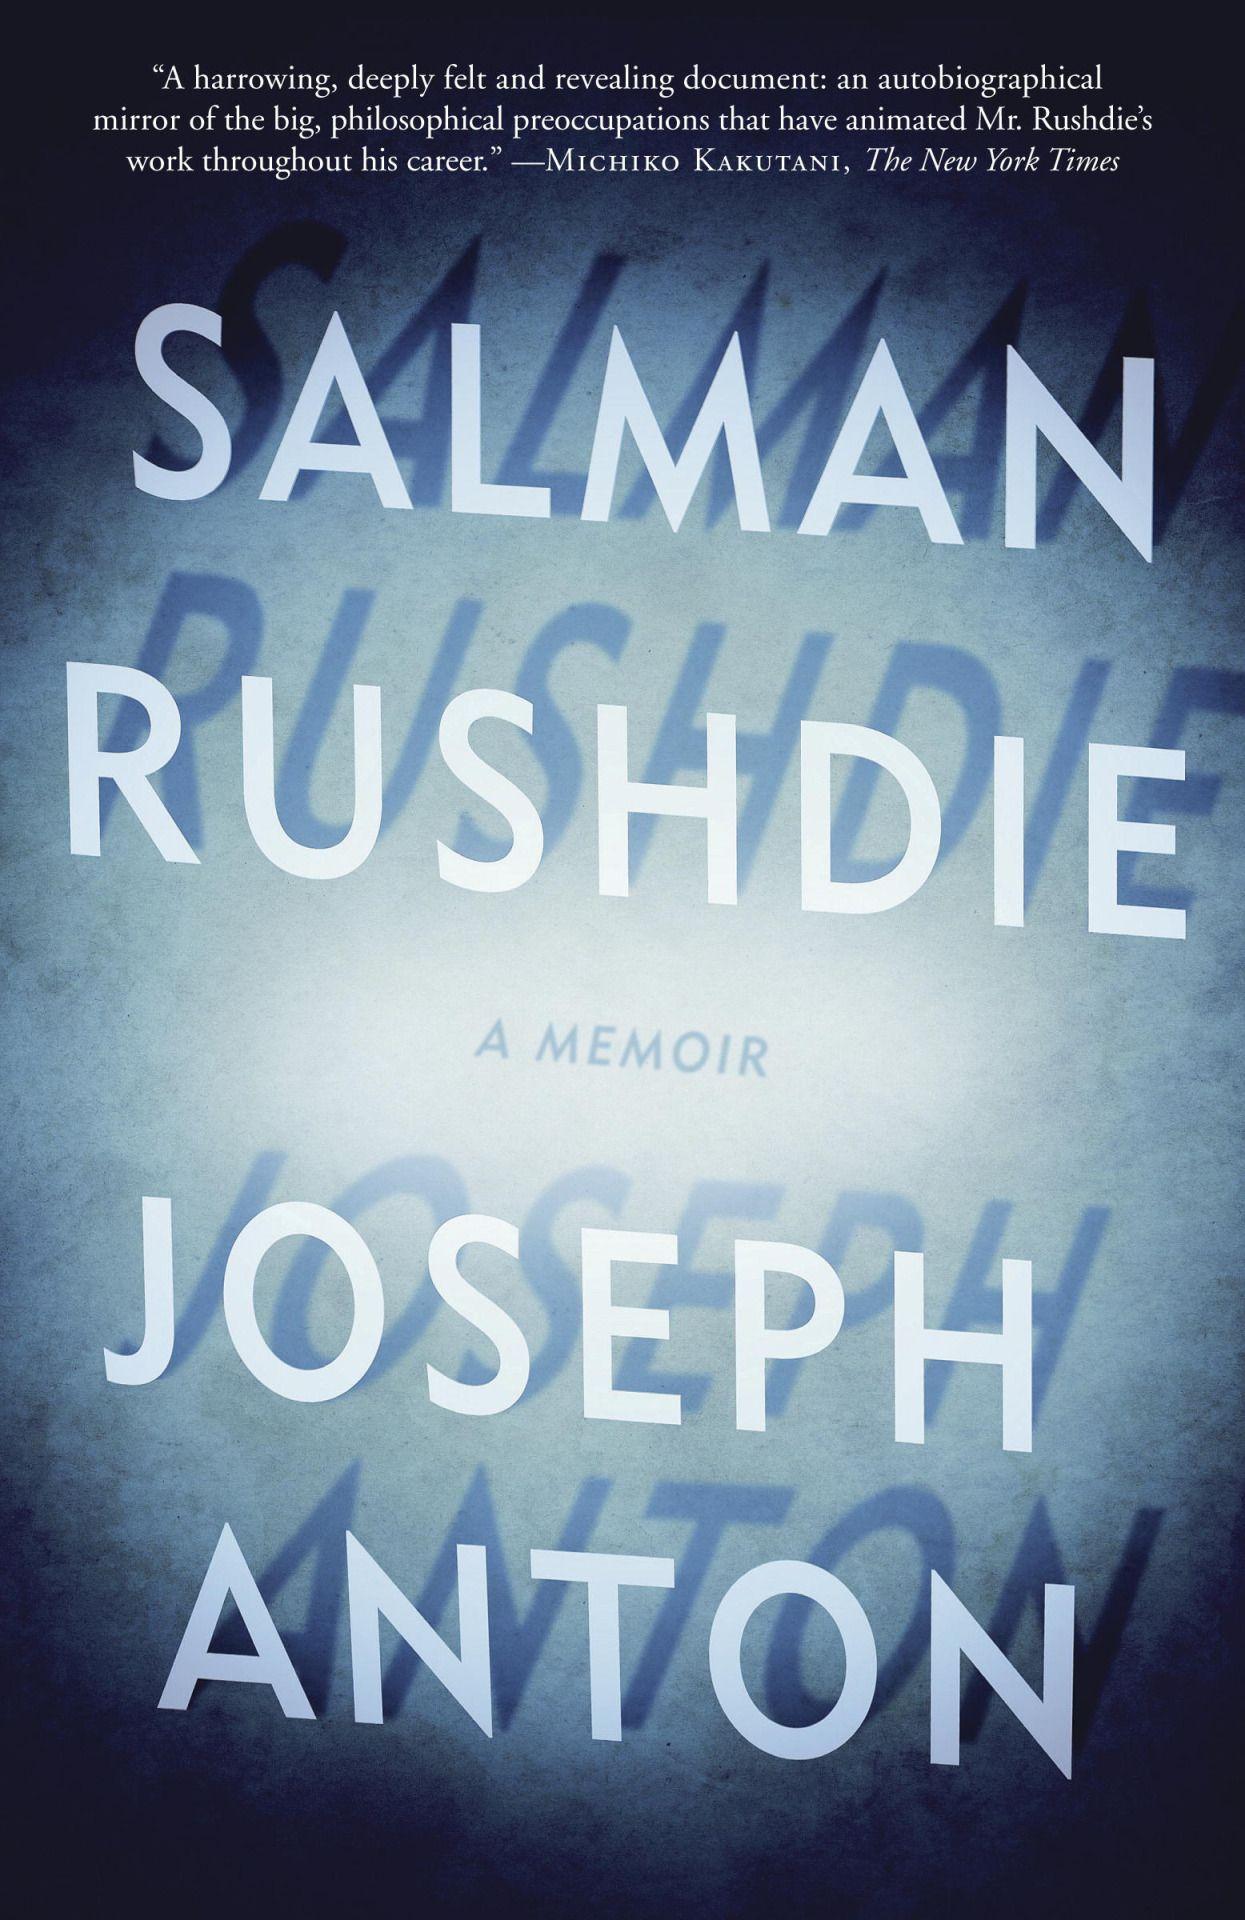 Book cover for Random House Trade Paperbacks | Art Director: Robbin Schiff | Designer: Andrea Geremia | Published 2013